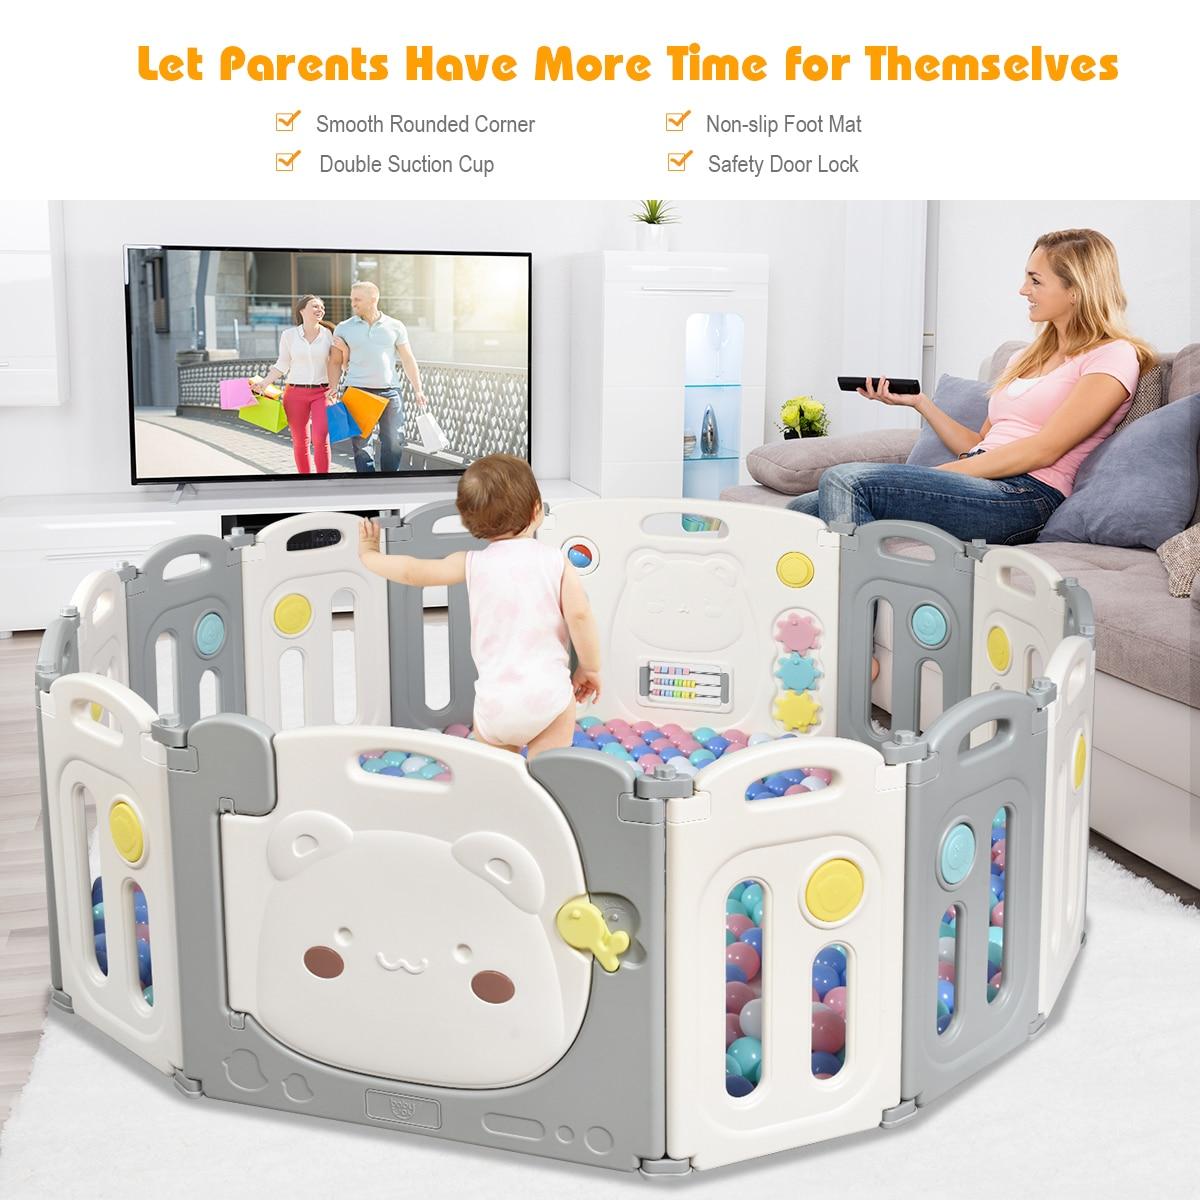 14-Panel Foldable Baby Playpen Child Safety Yard Activity Center w/ Storage Bag